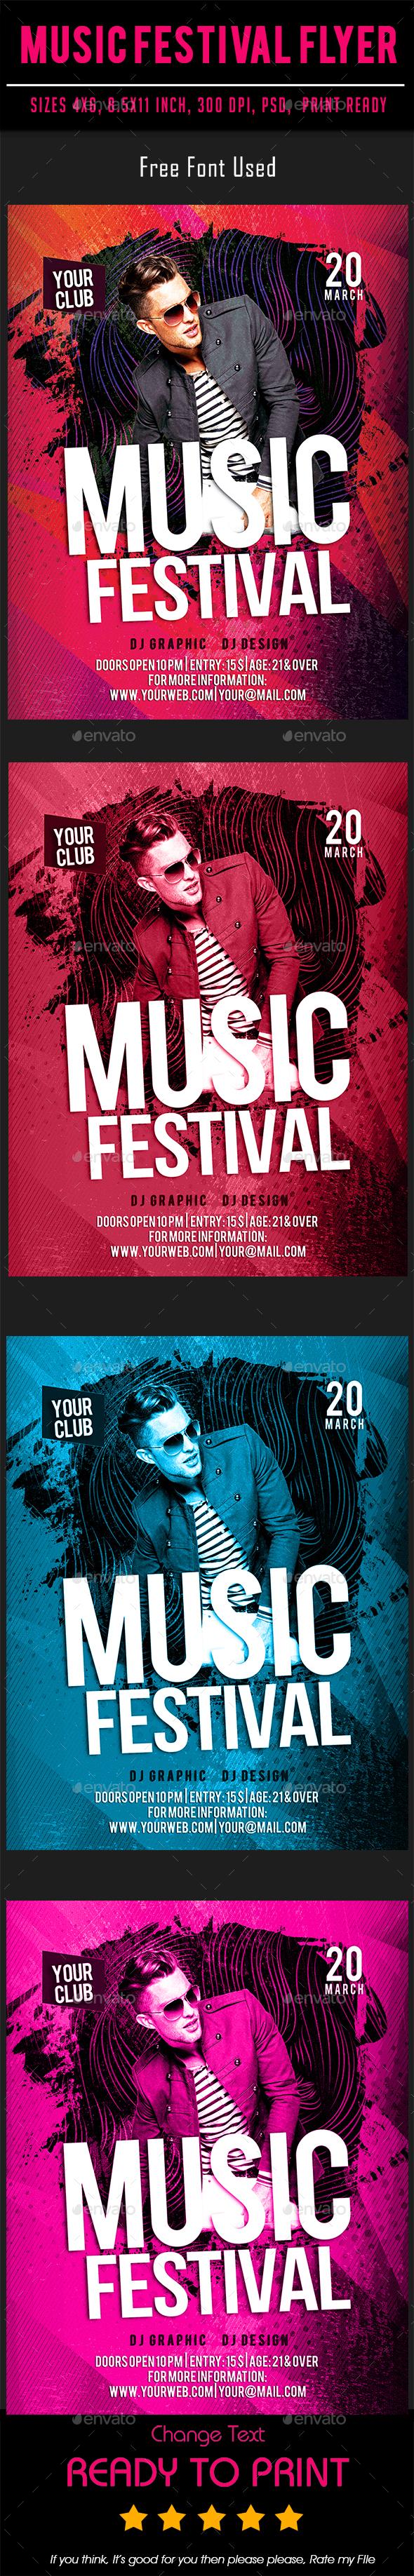 Music Festival Flyer - Flyers Print Templates